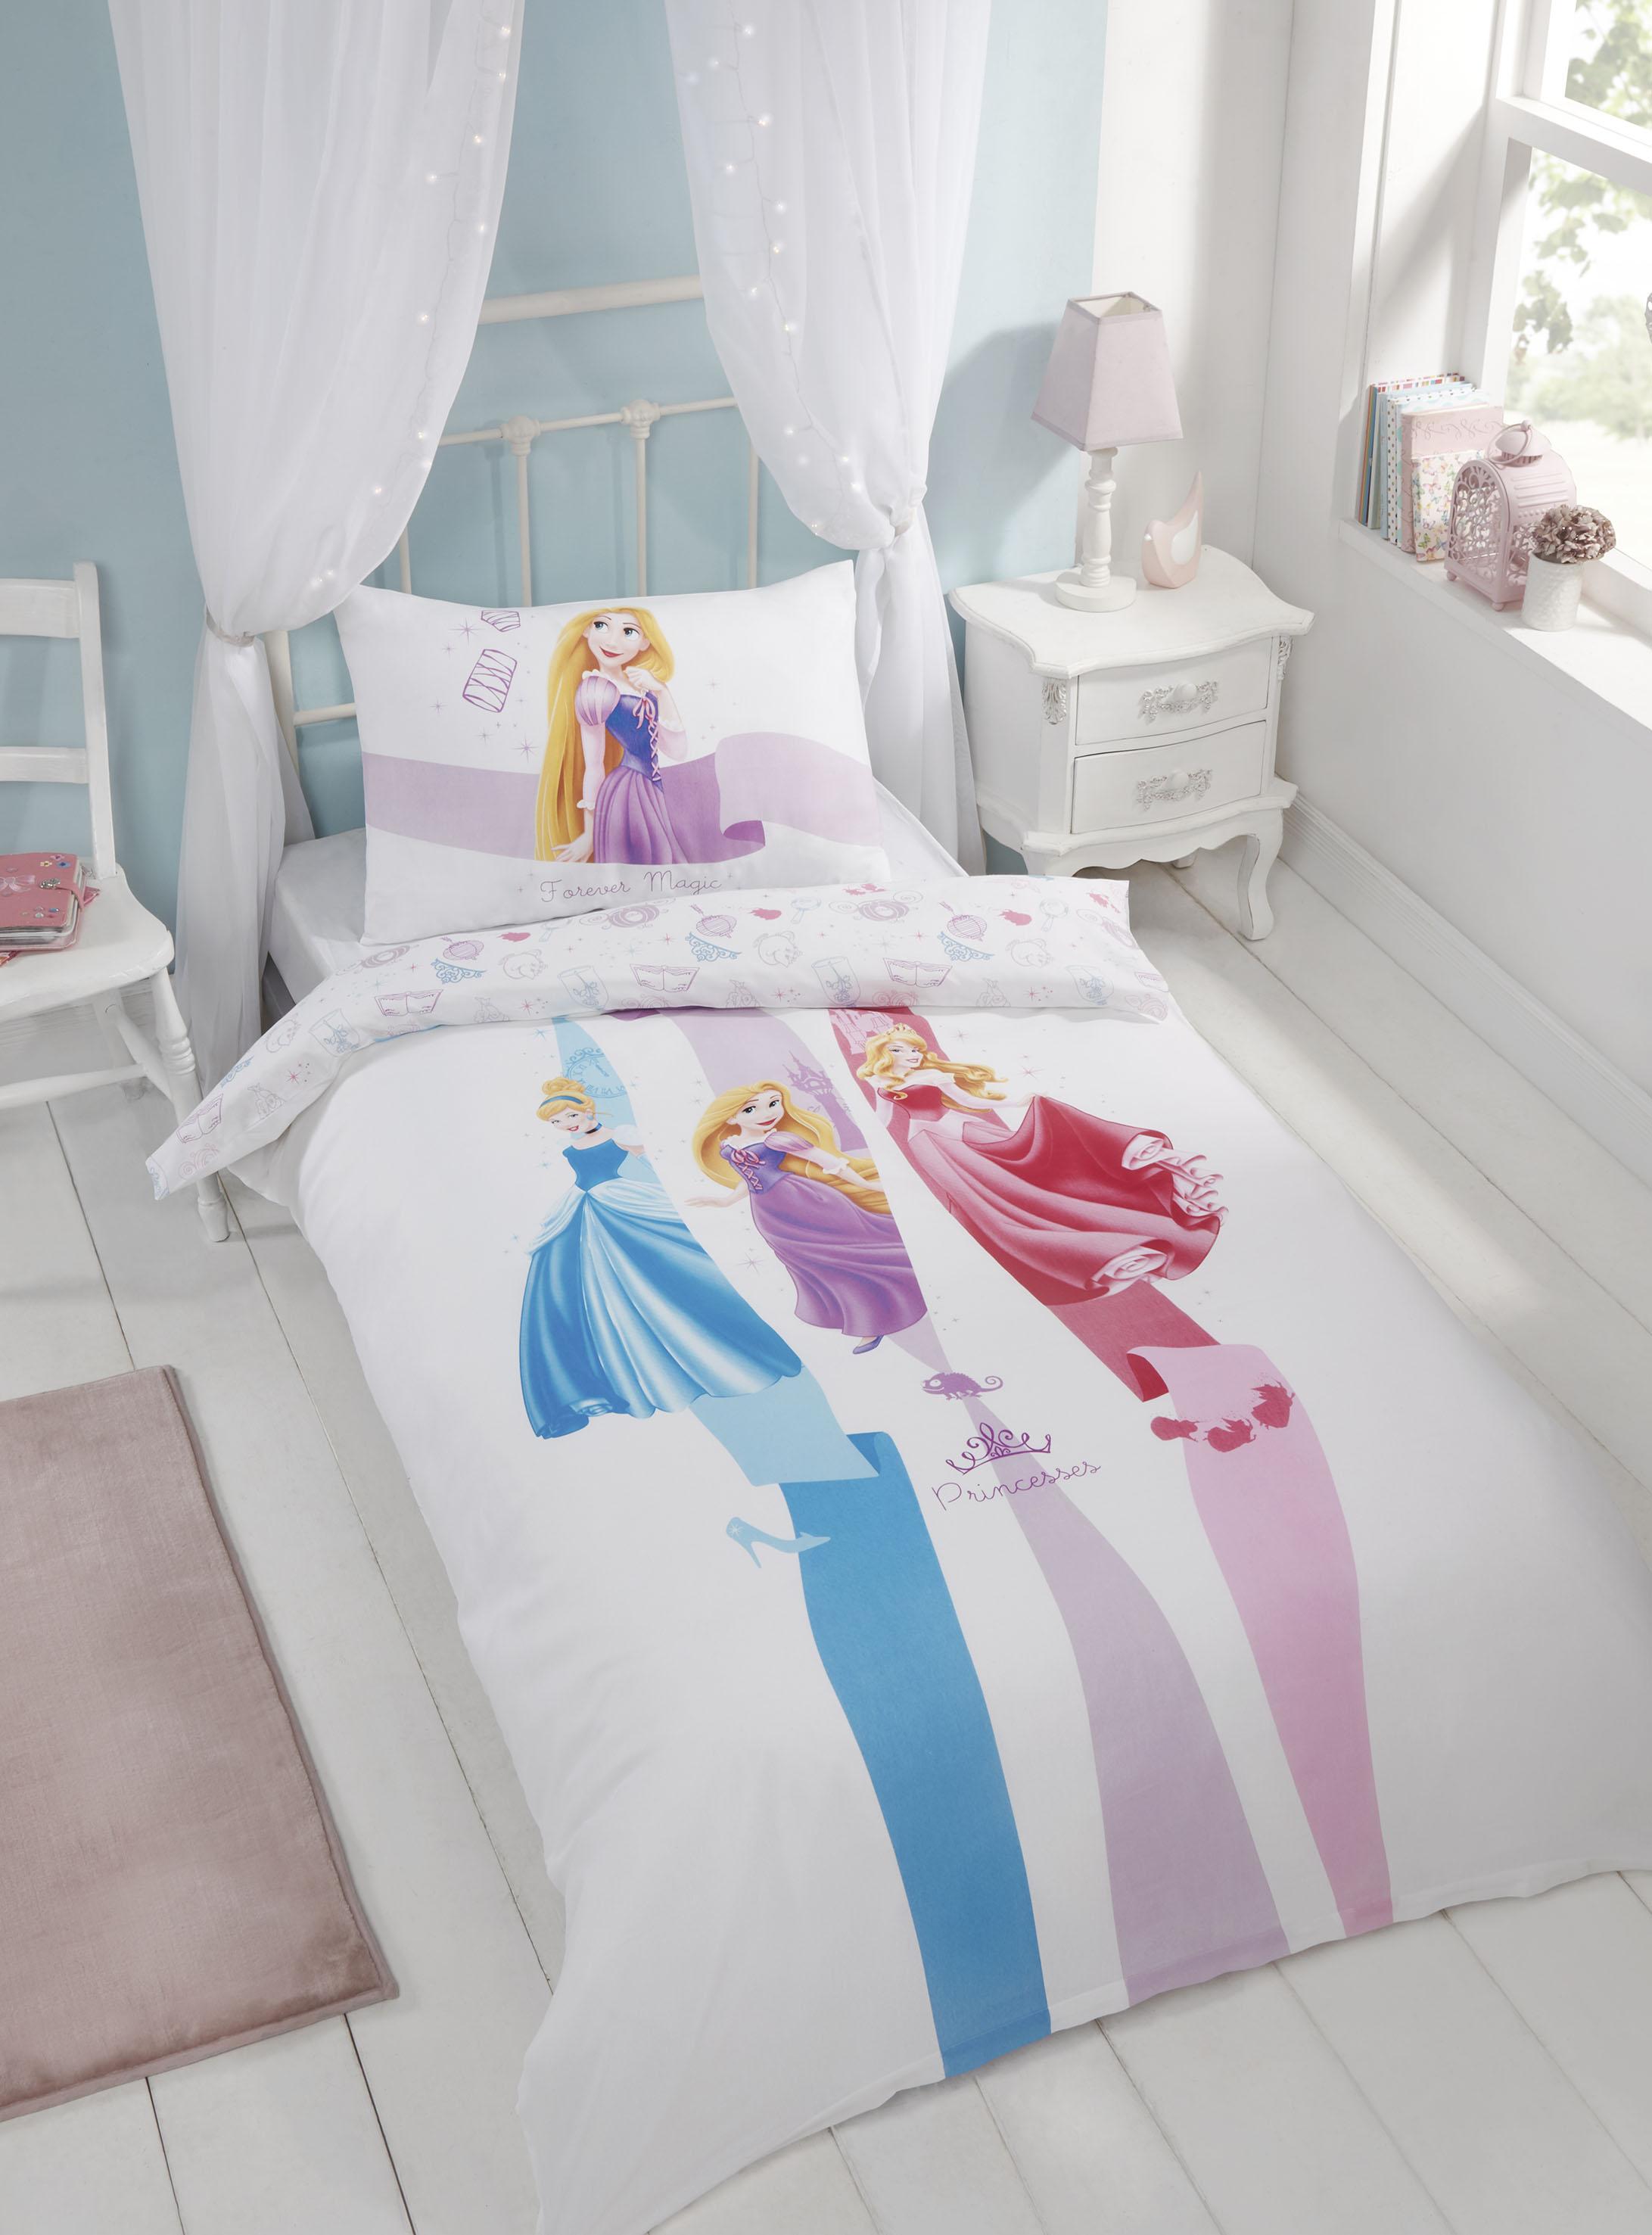 Copripiumino Principesse.Ufficiale Principesse Disney Singolo Set Copripiumino Da Bambina